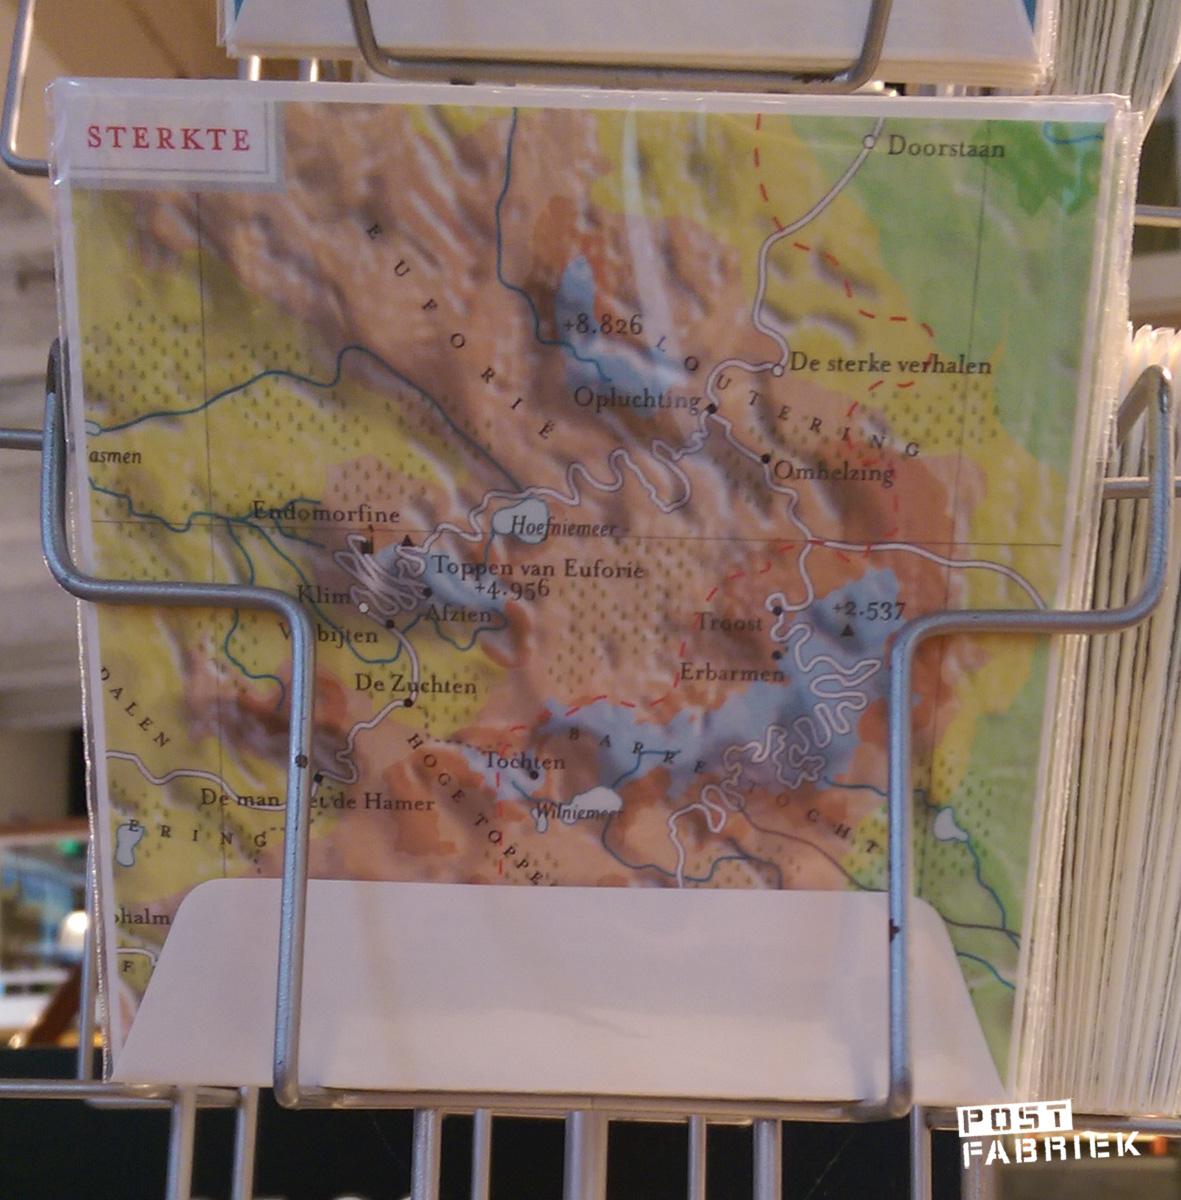 'Sterkte' Atlas van de Belevingswereld kaart